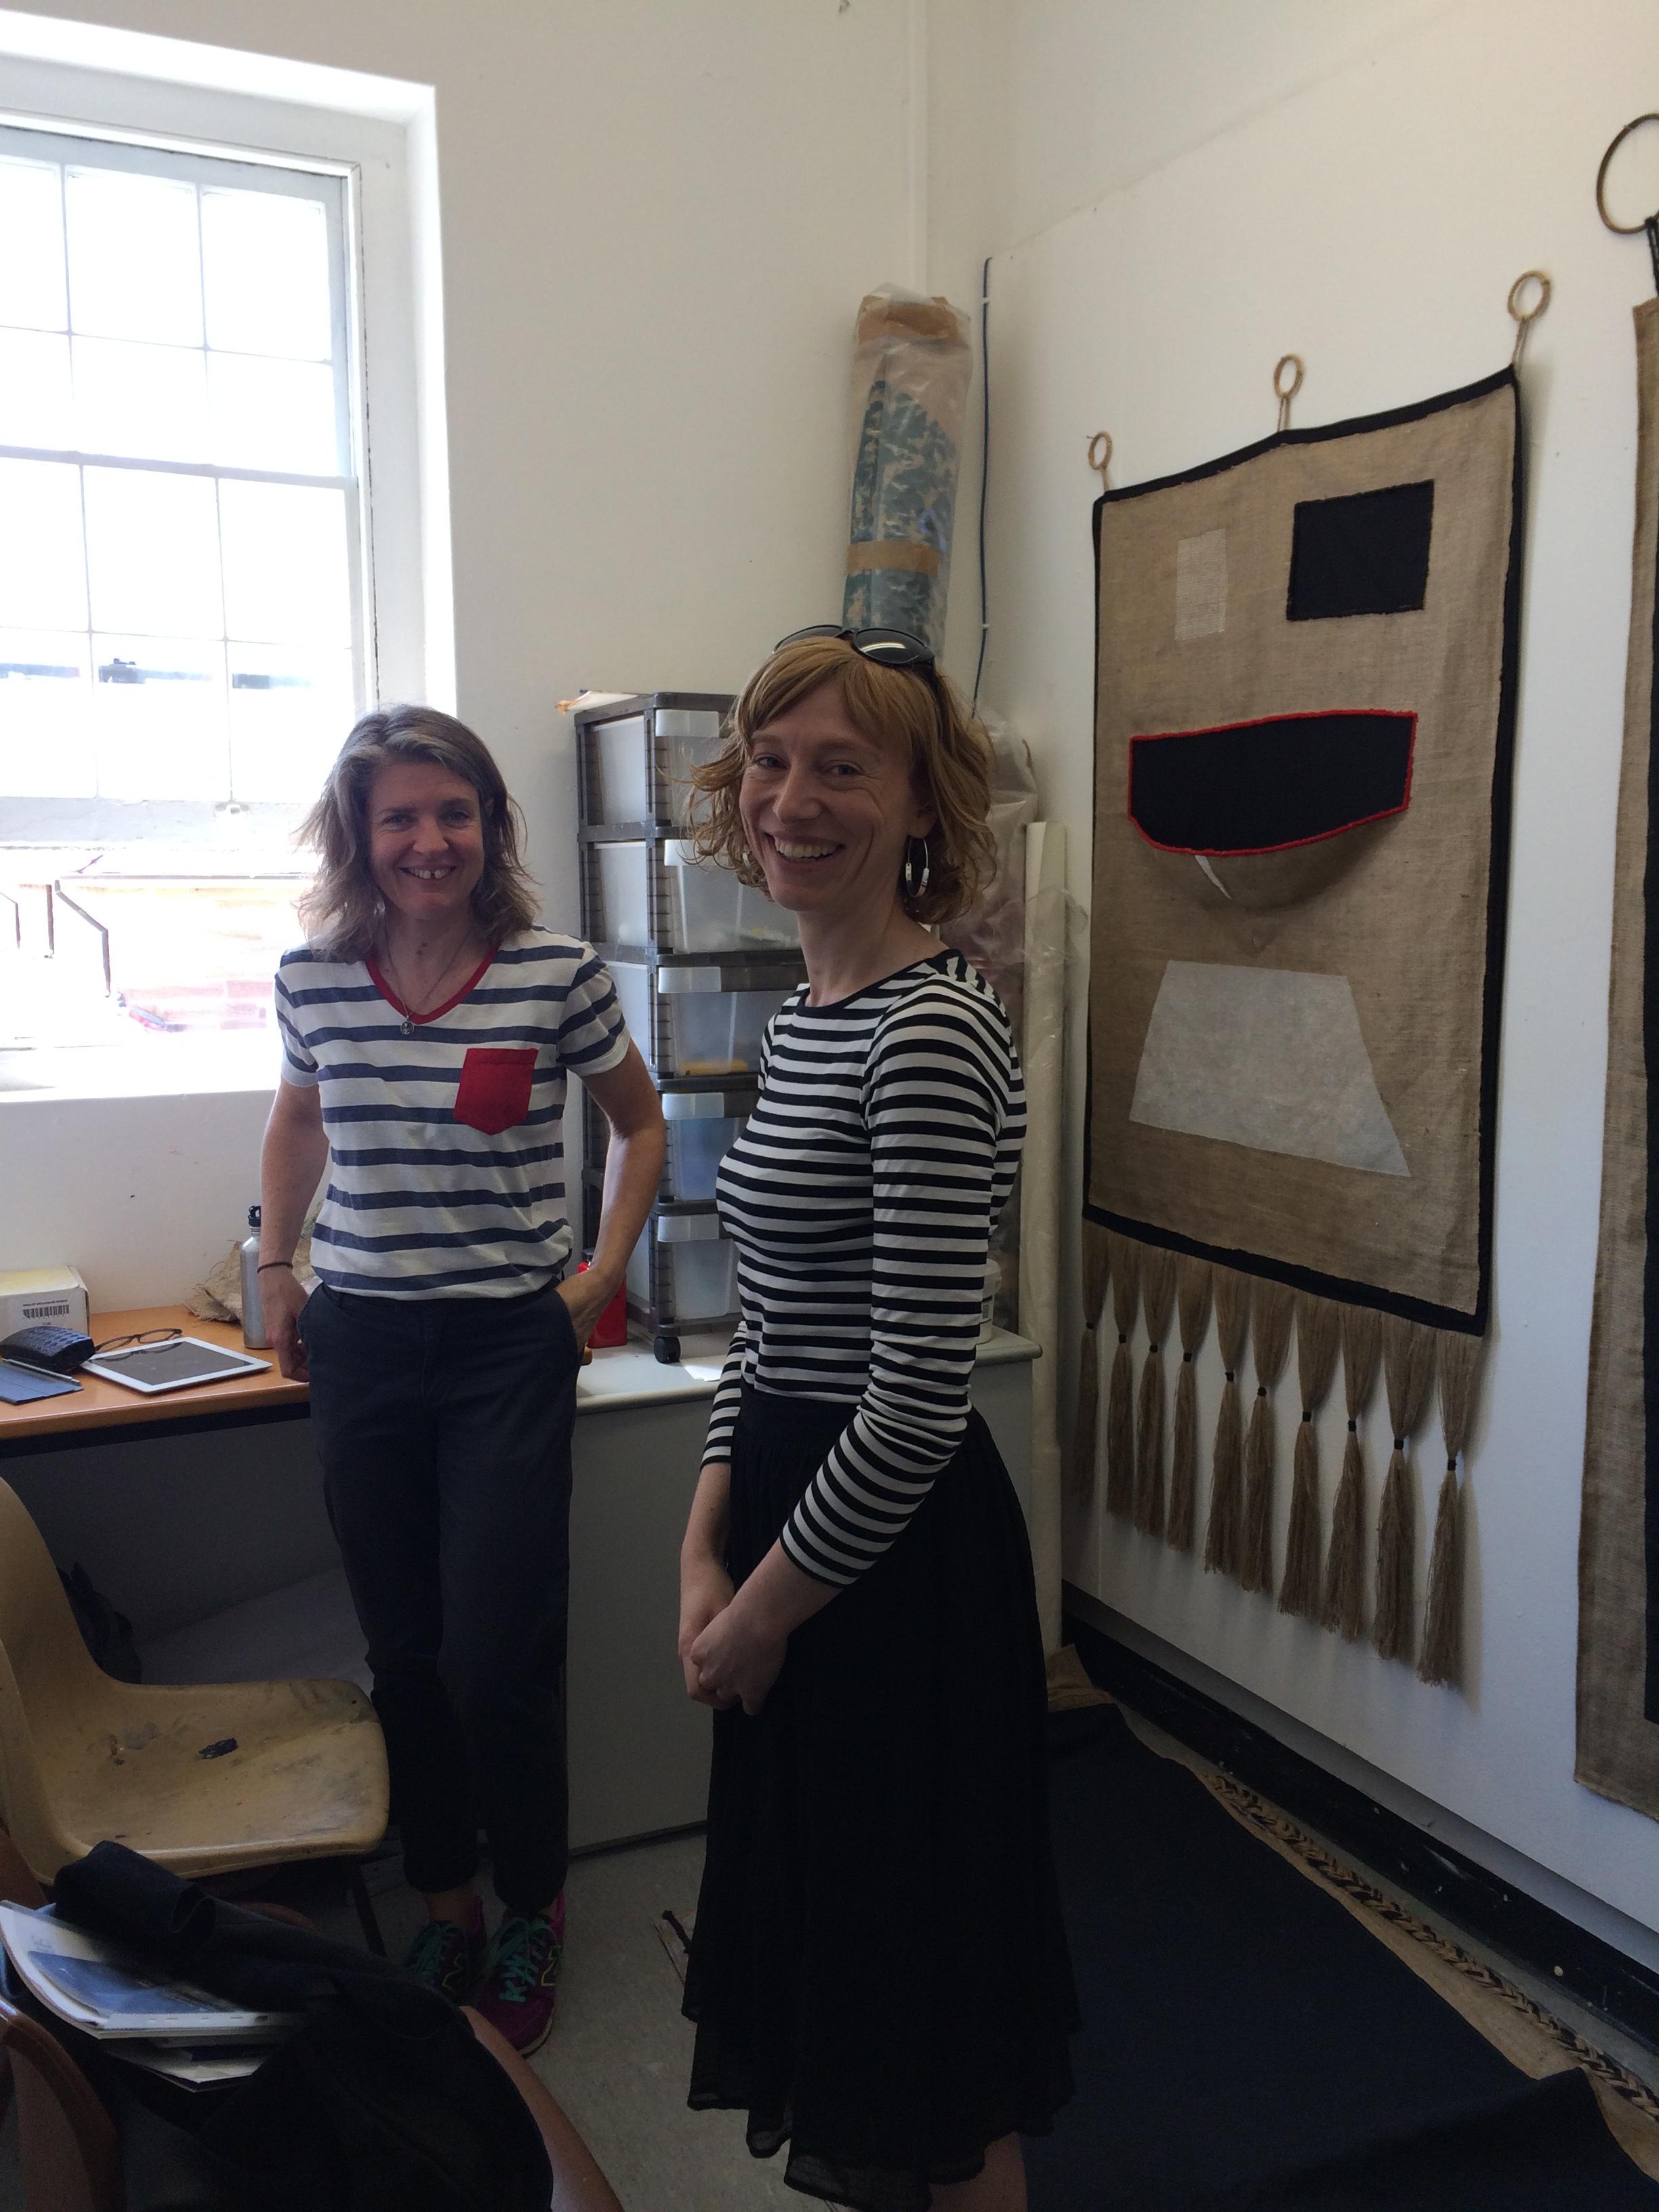 Liz Pulie in the studio with Megan Robson